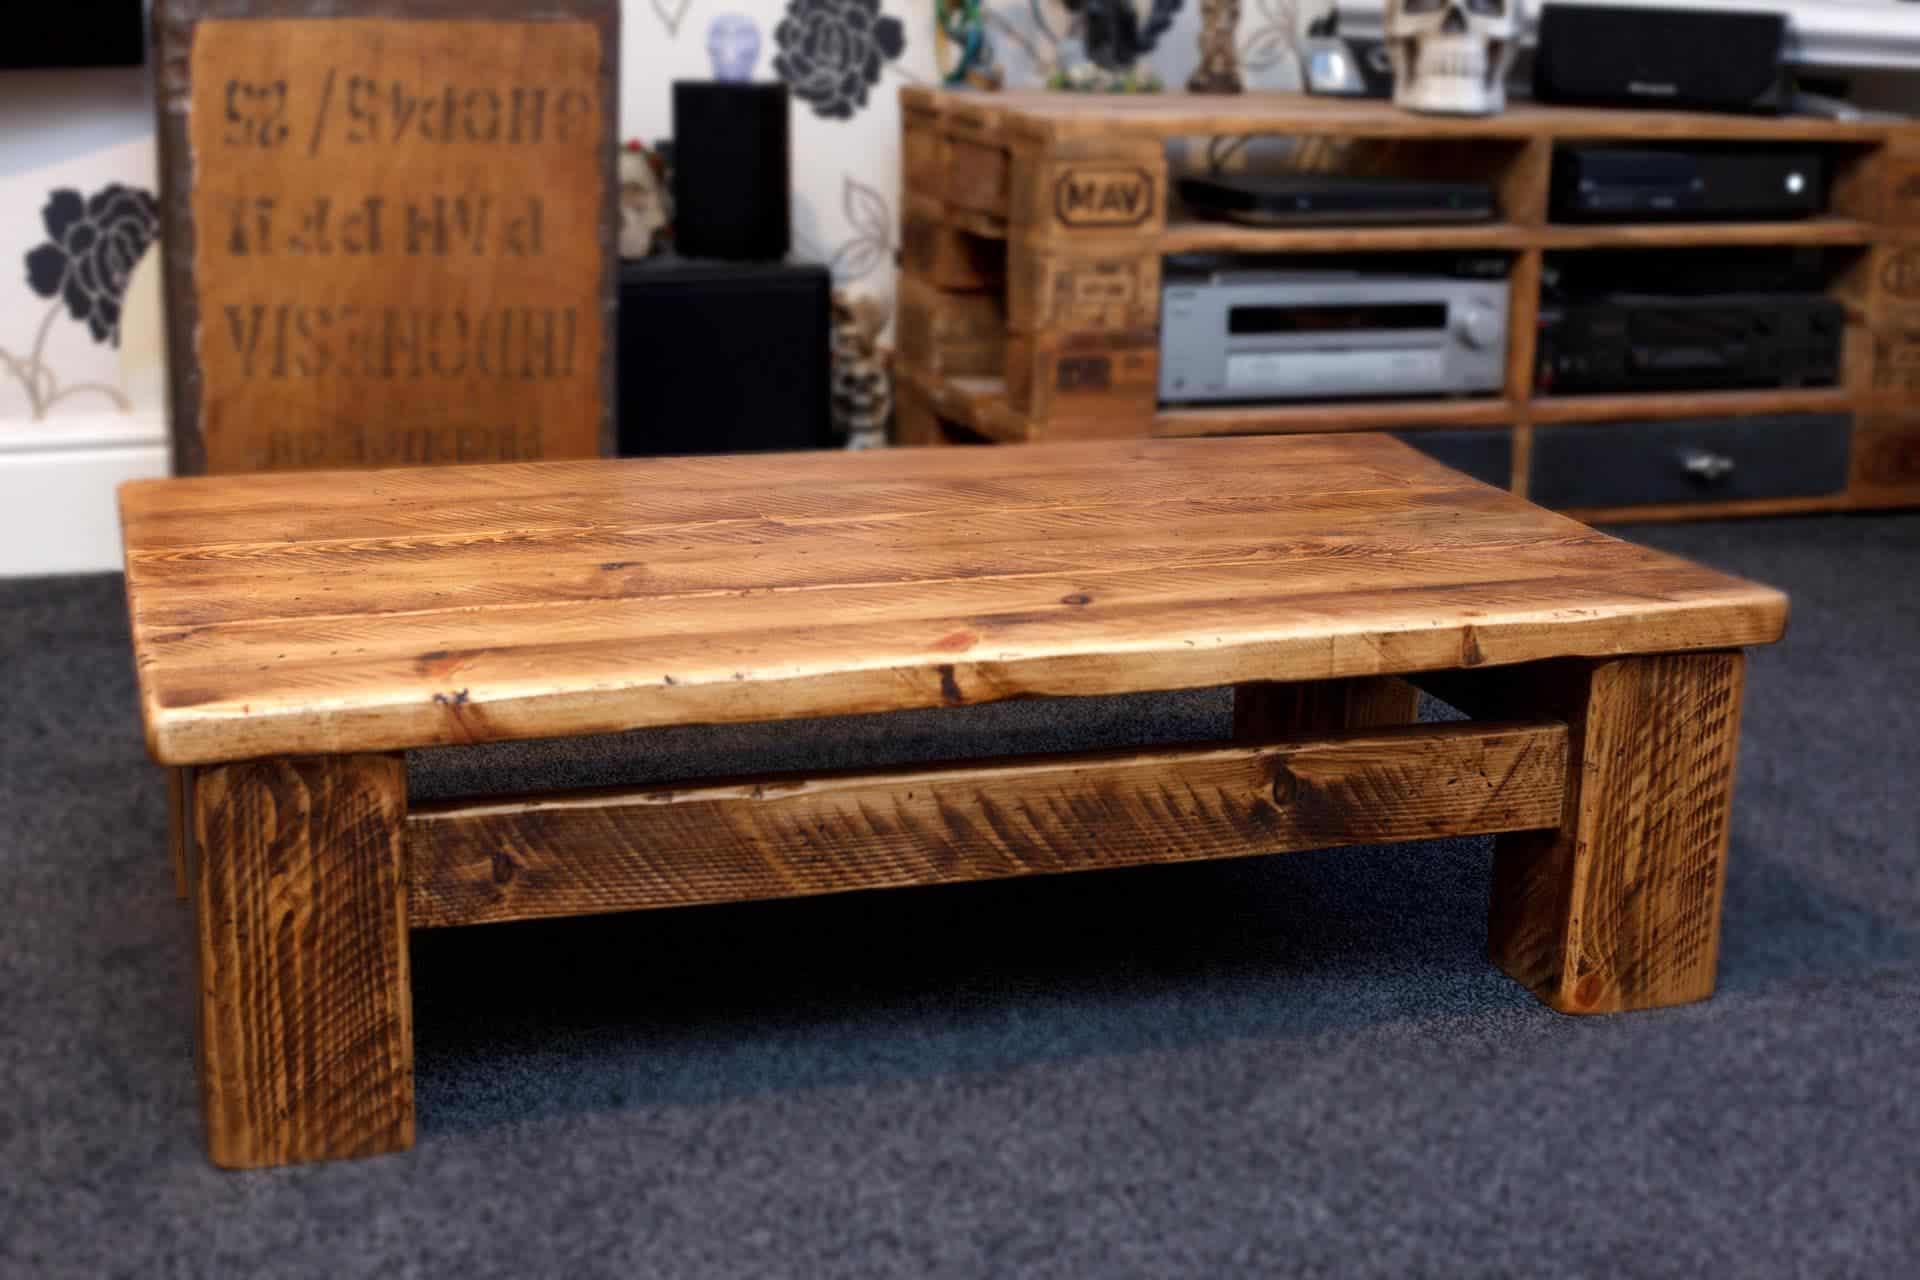 Low Rustic Plank Sherwood Coffee Table